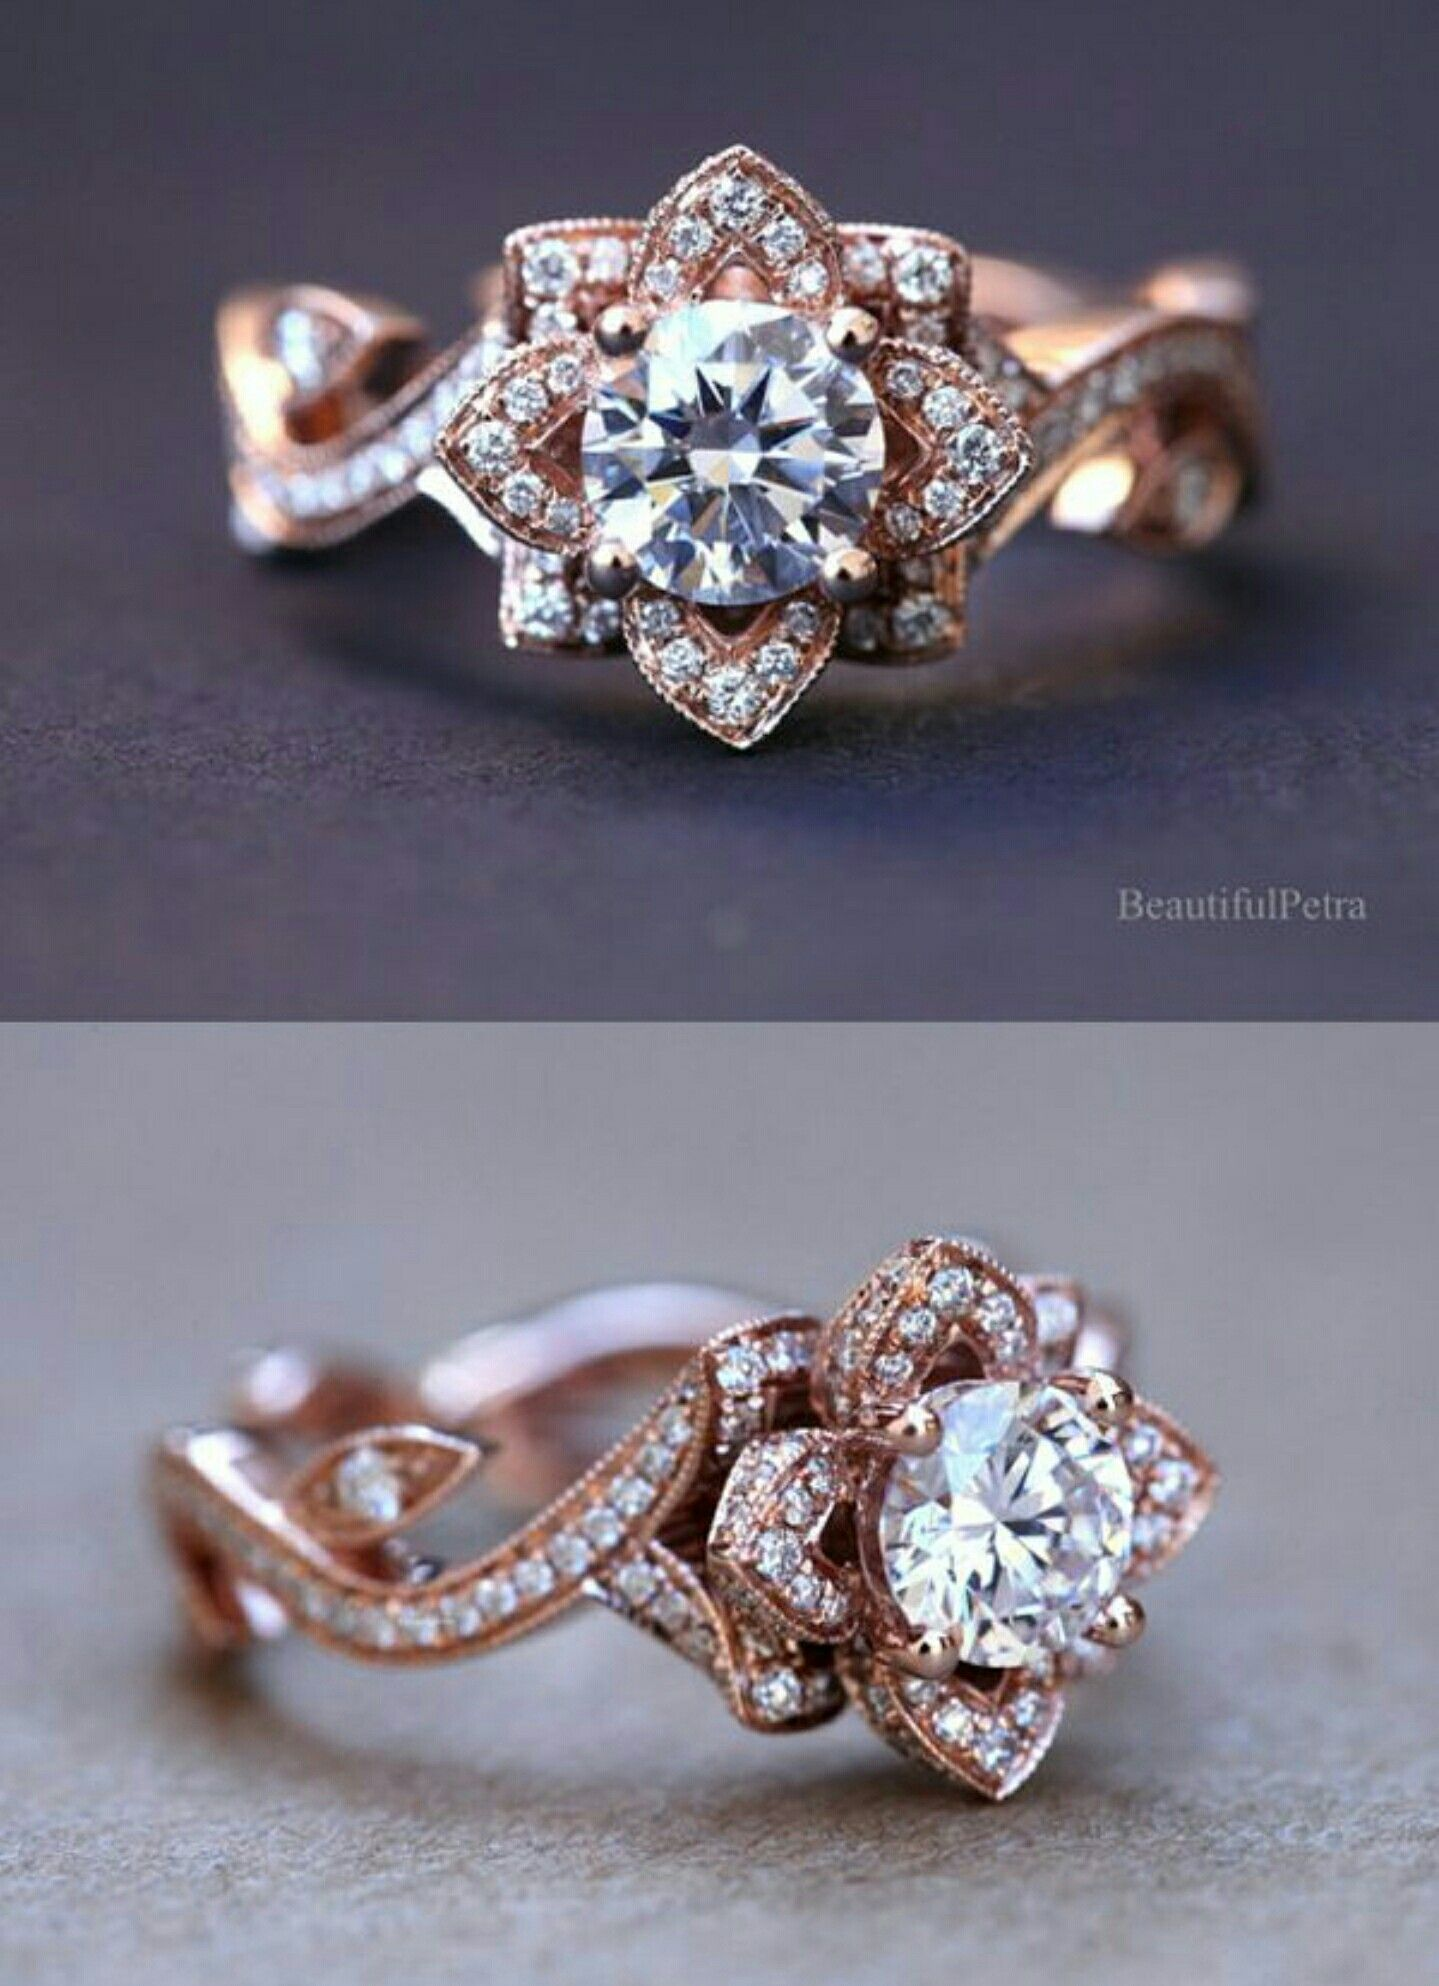 Pin by Elizabeth V on Rings Pinterest Wedding